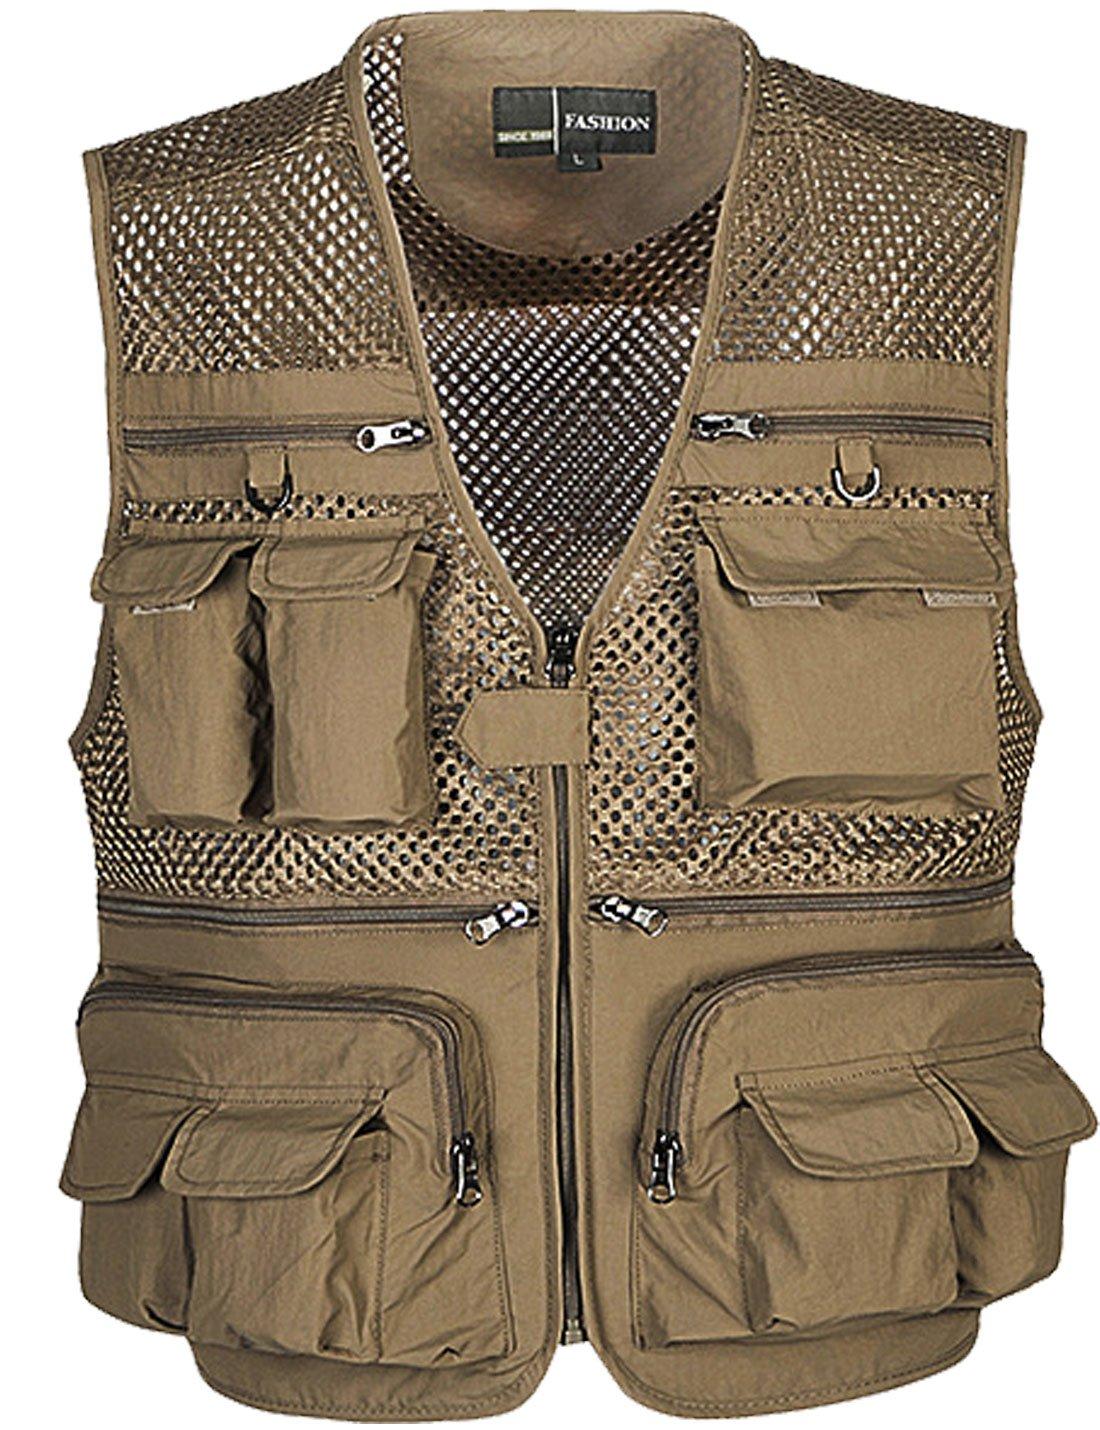 Zhusheng Men's Mesh Multi Pockets Photography Hunting Fly Fishing Outdoor Quick Dry Vest Breathable Waistcoat Jackets (Large(Asia Tag 3XL), Khaki)